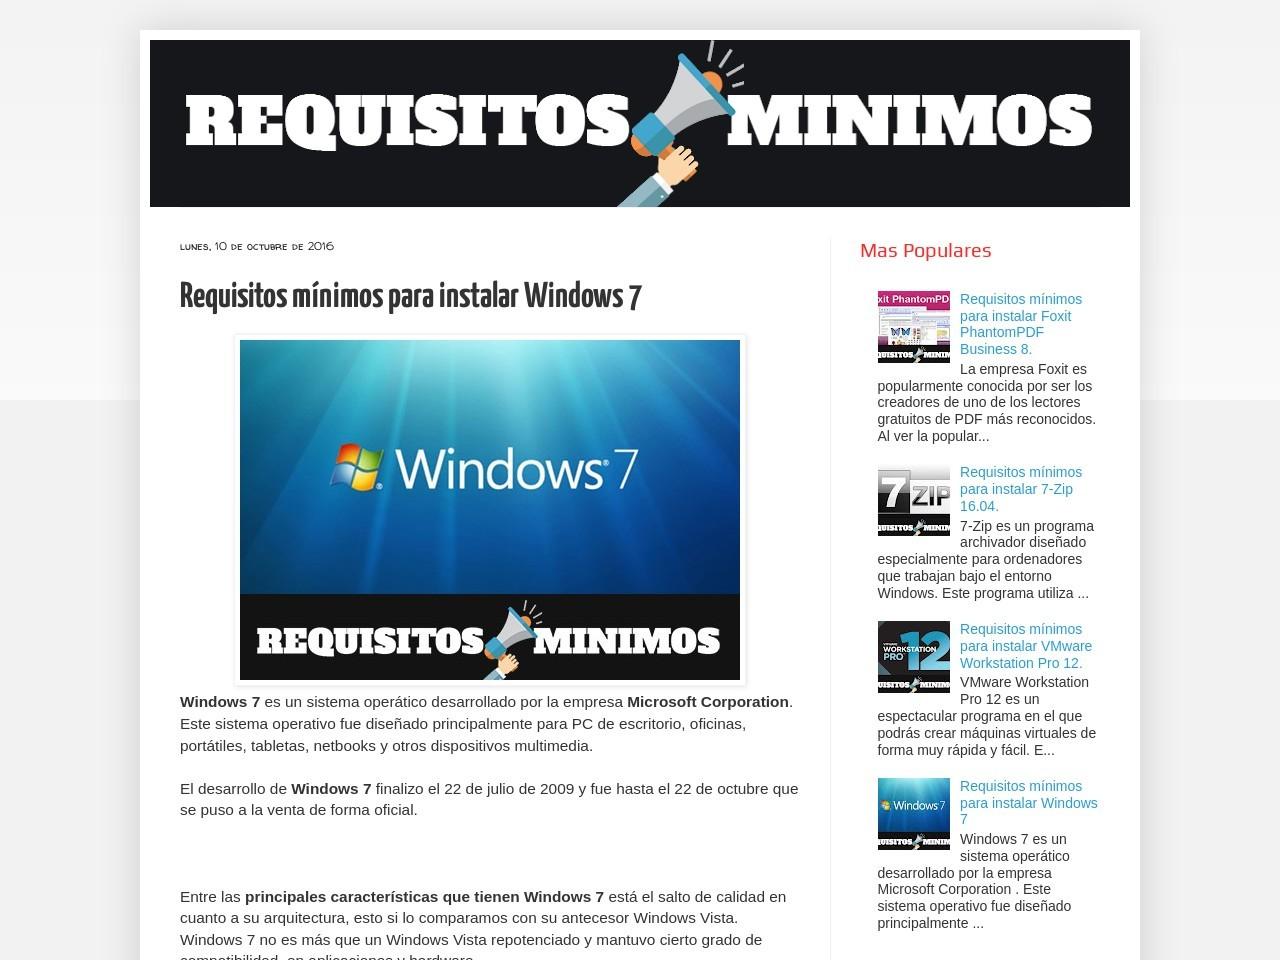 Requisitos minimos windows 7